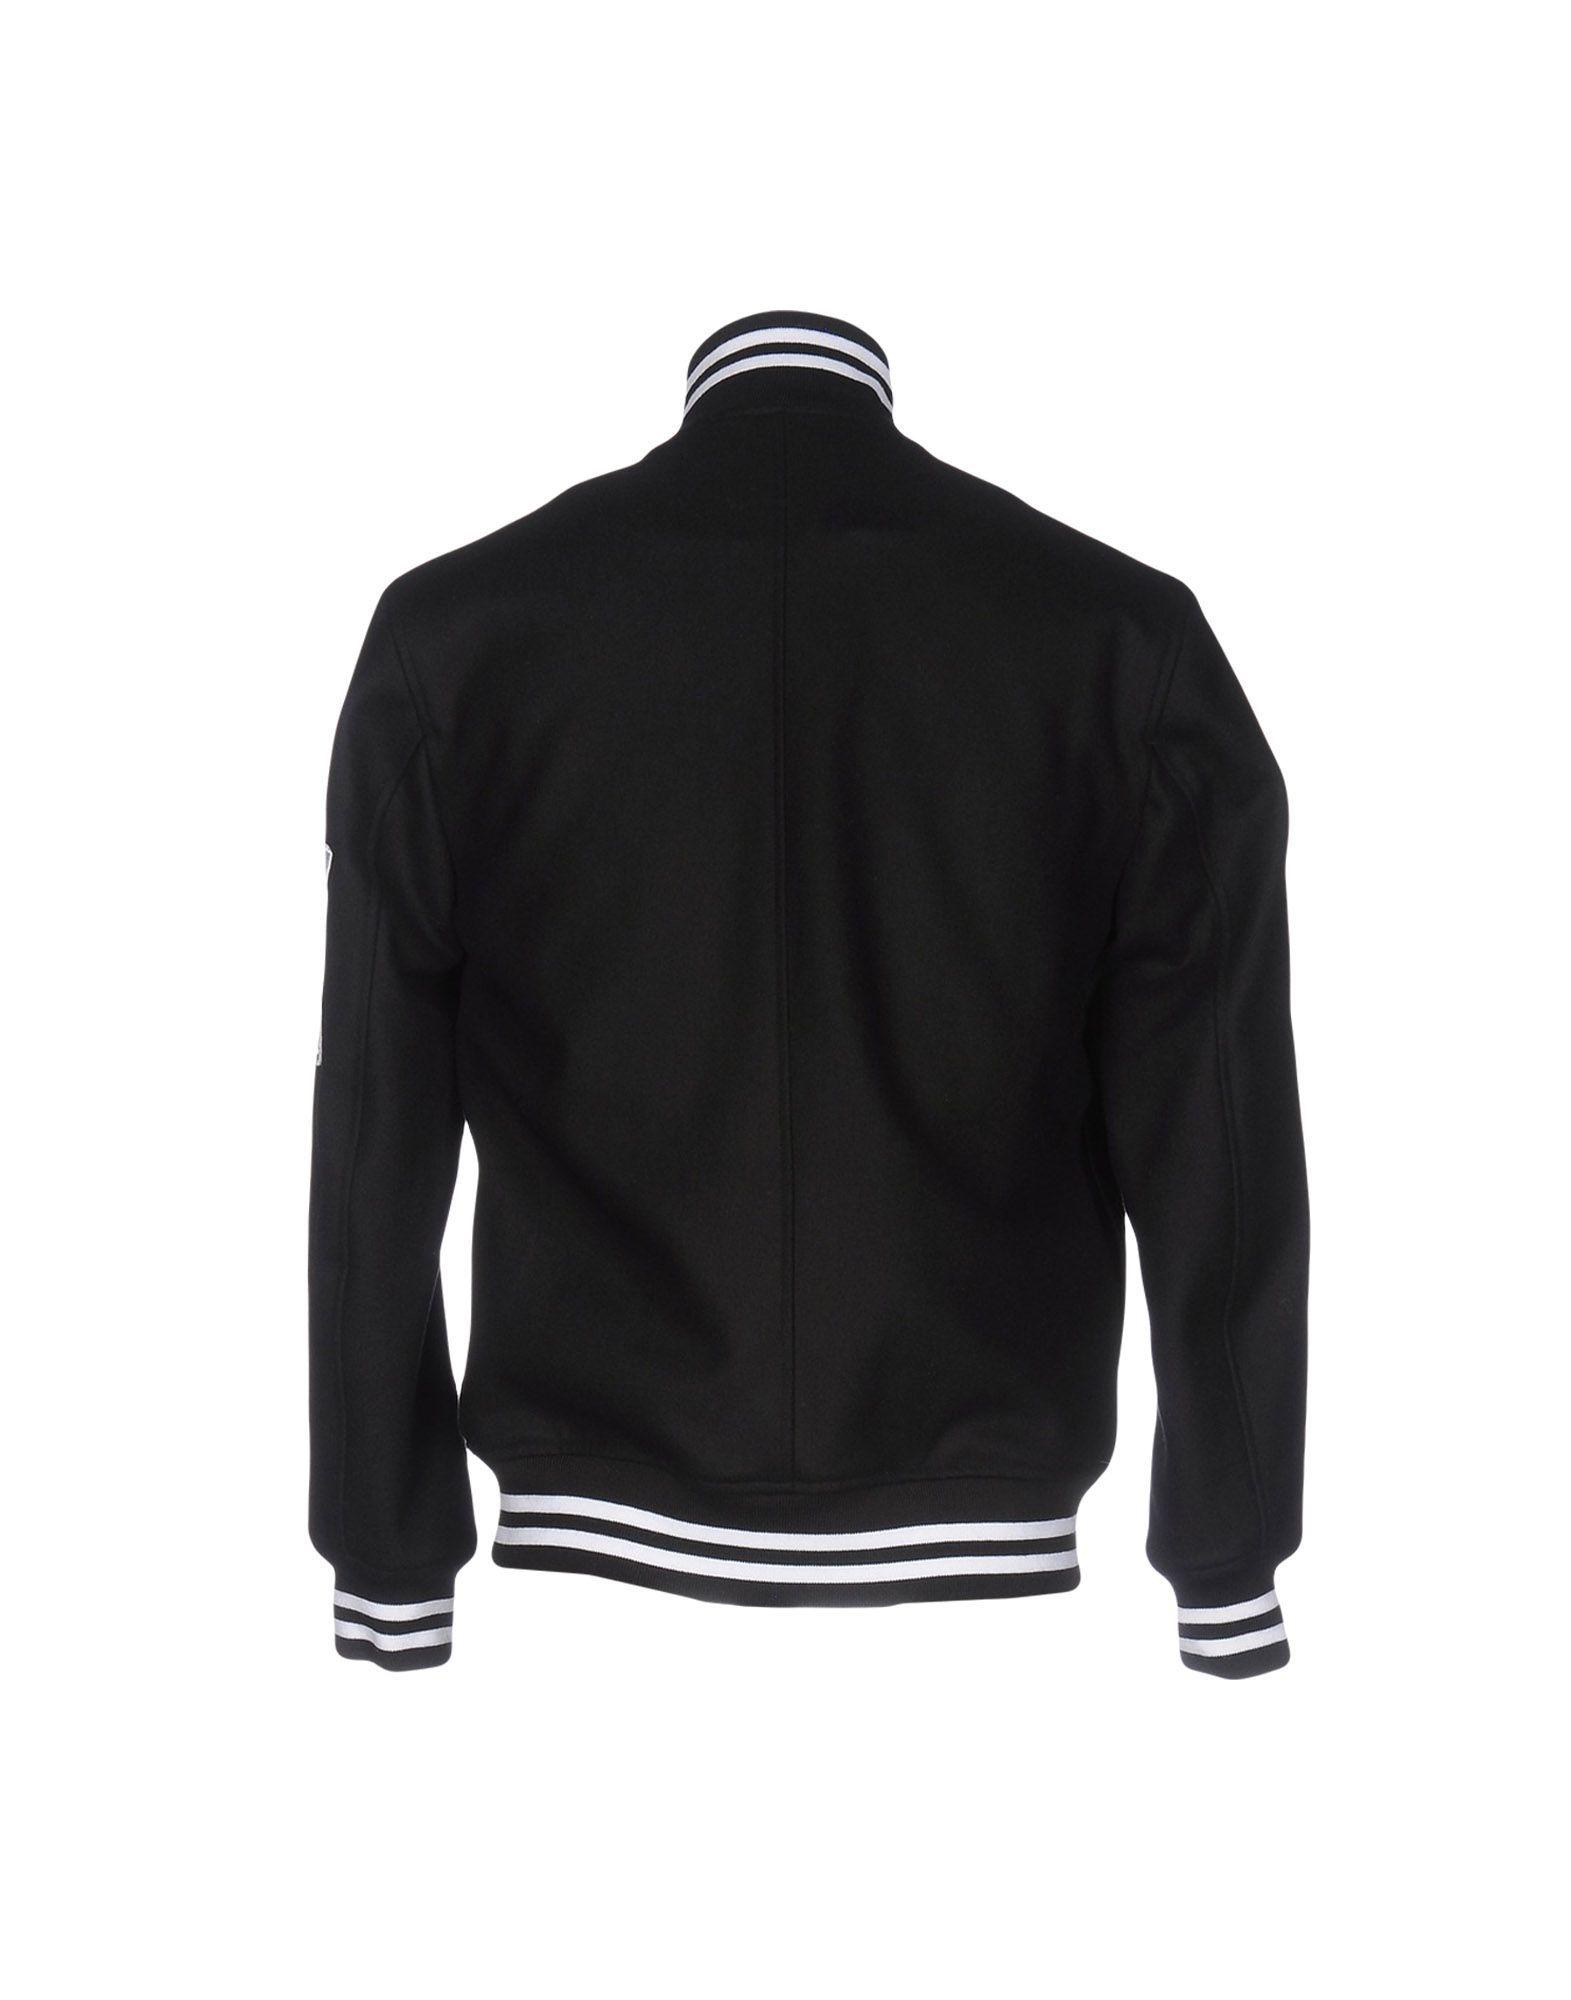 Nicopanda Black Wool Bomber Jacket